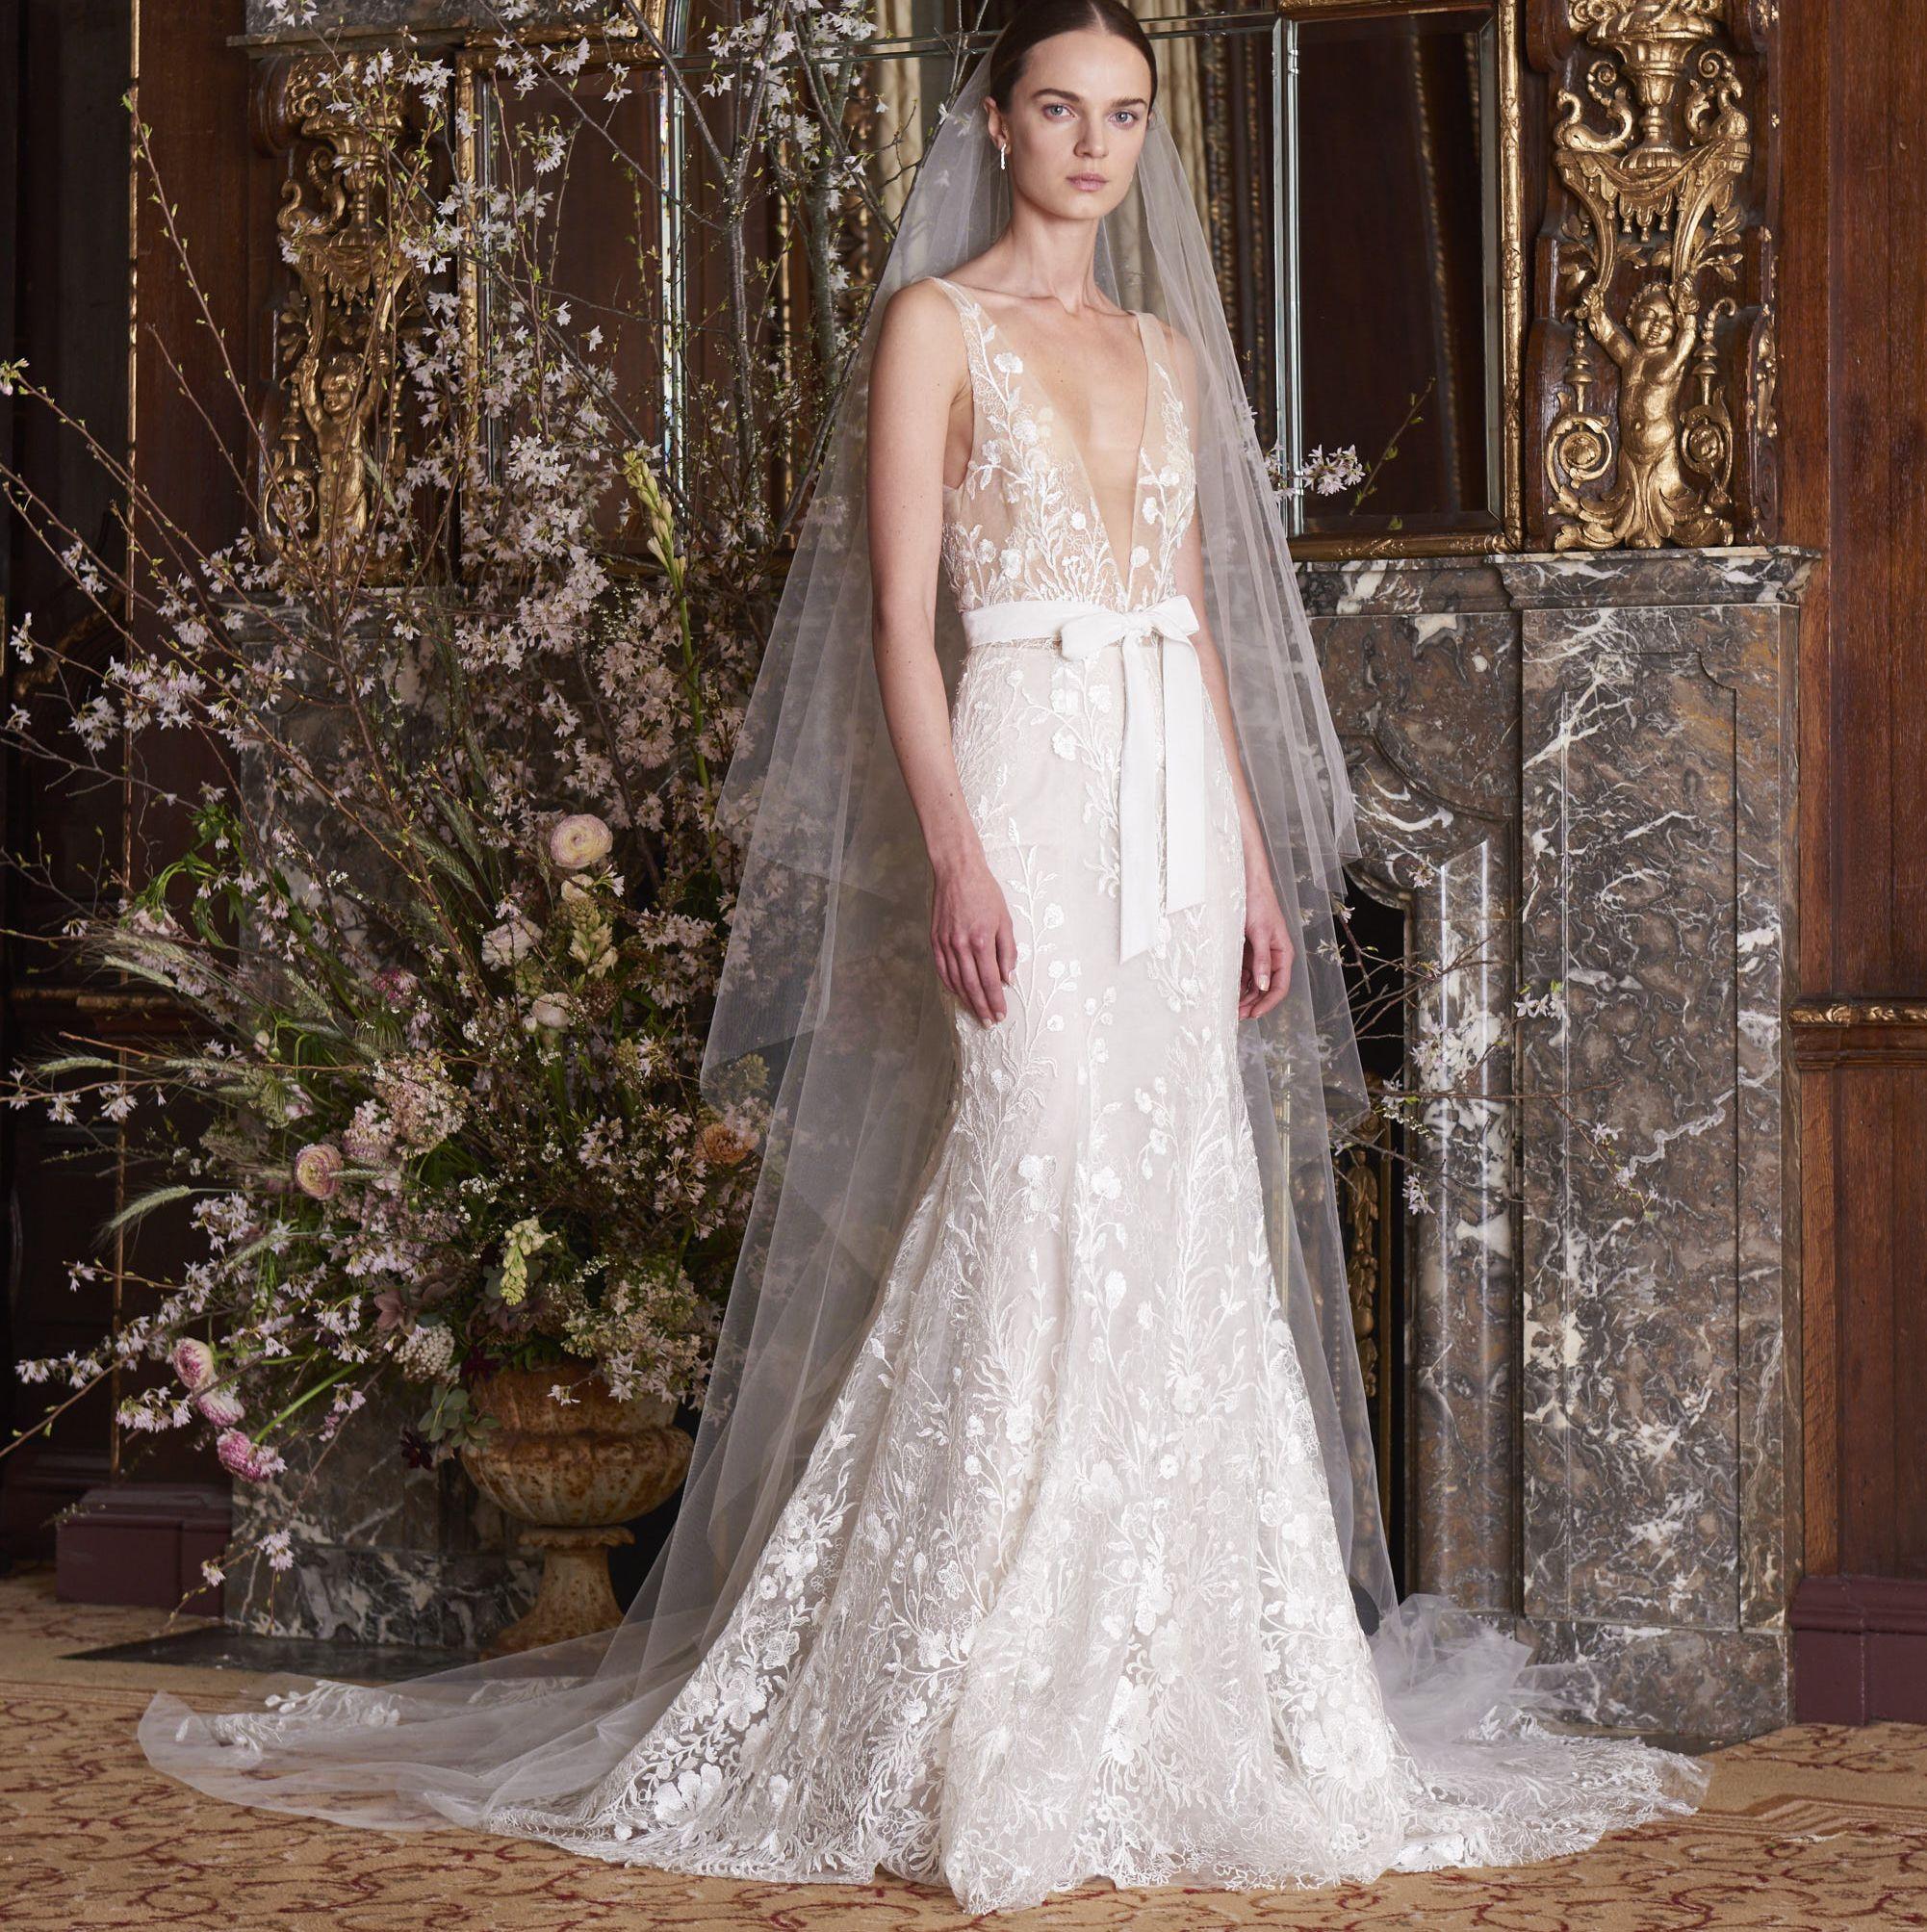 Spring 2019 Wedding Dress Trends Spring 2019 Bridal Dress Trends